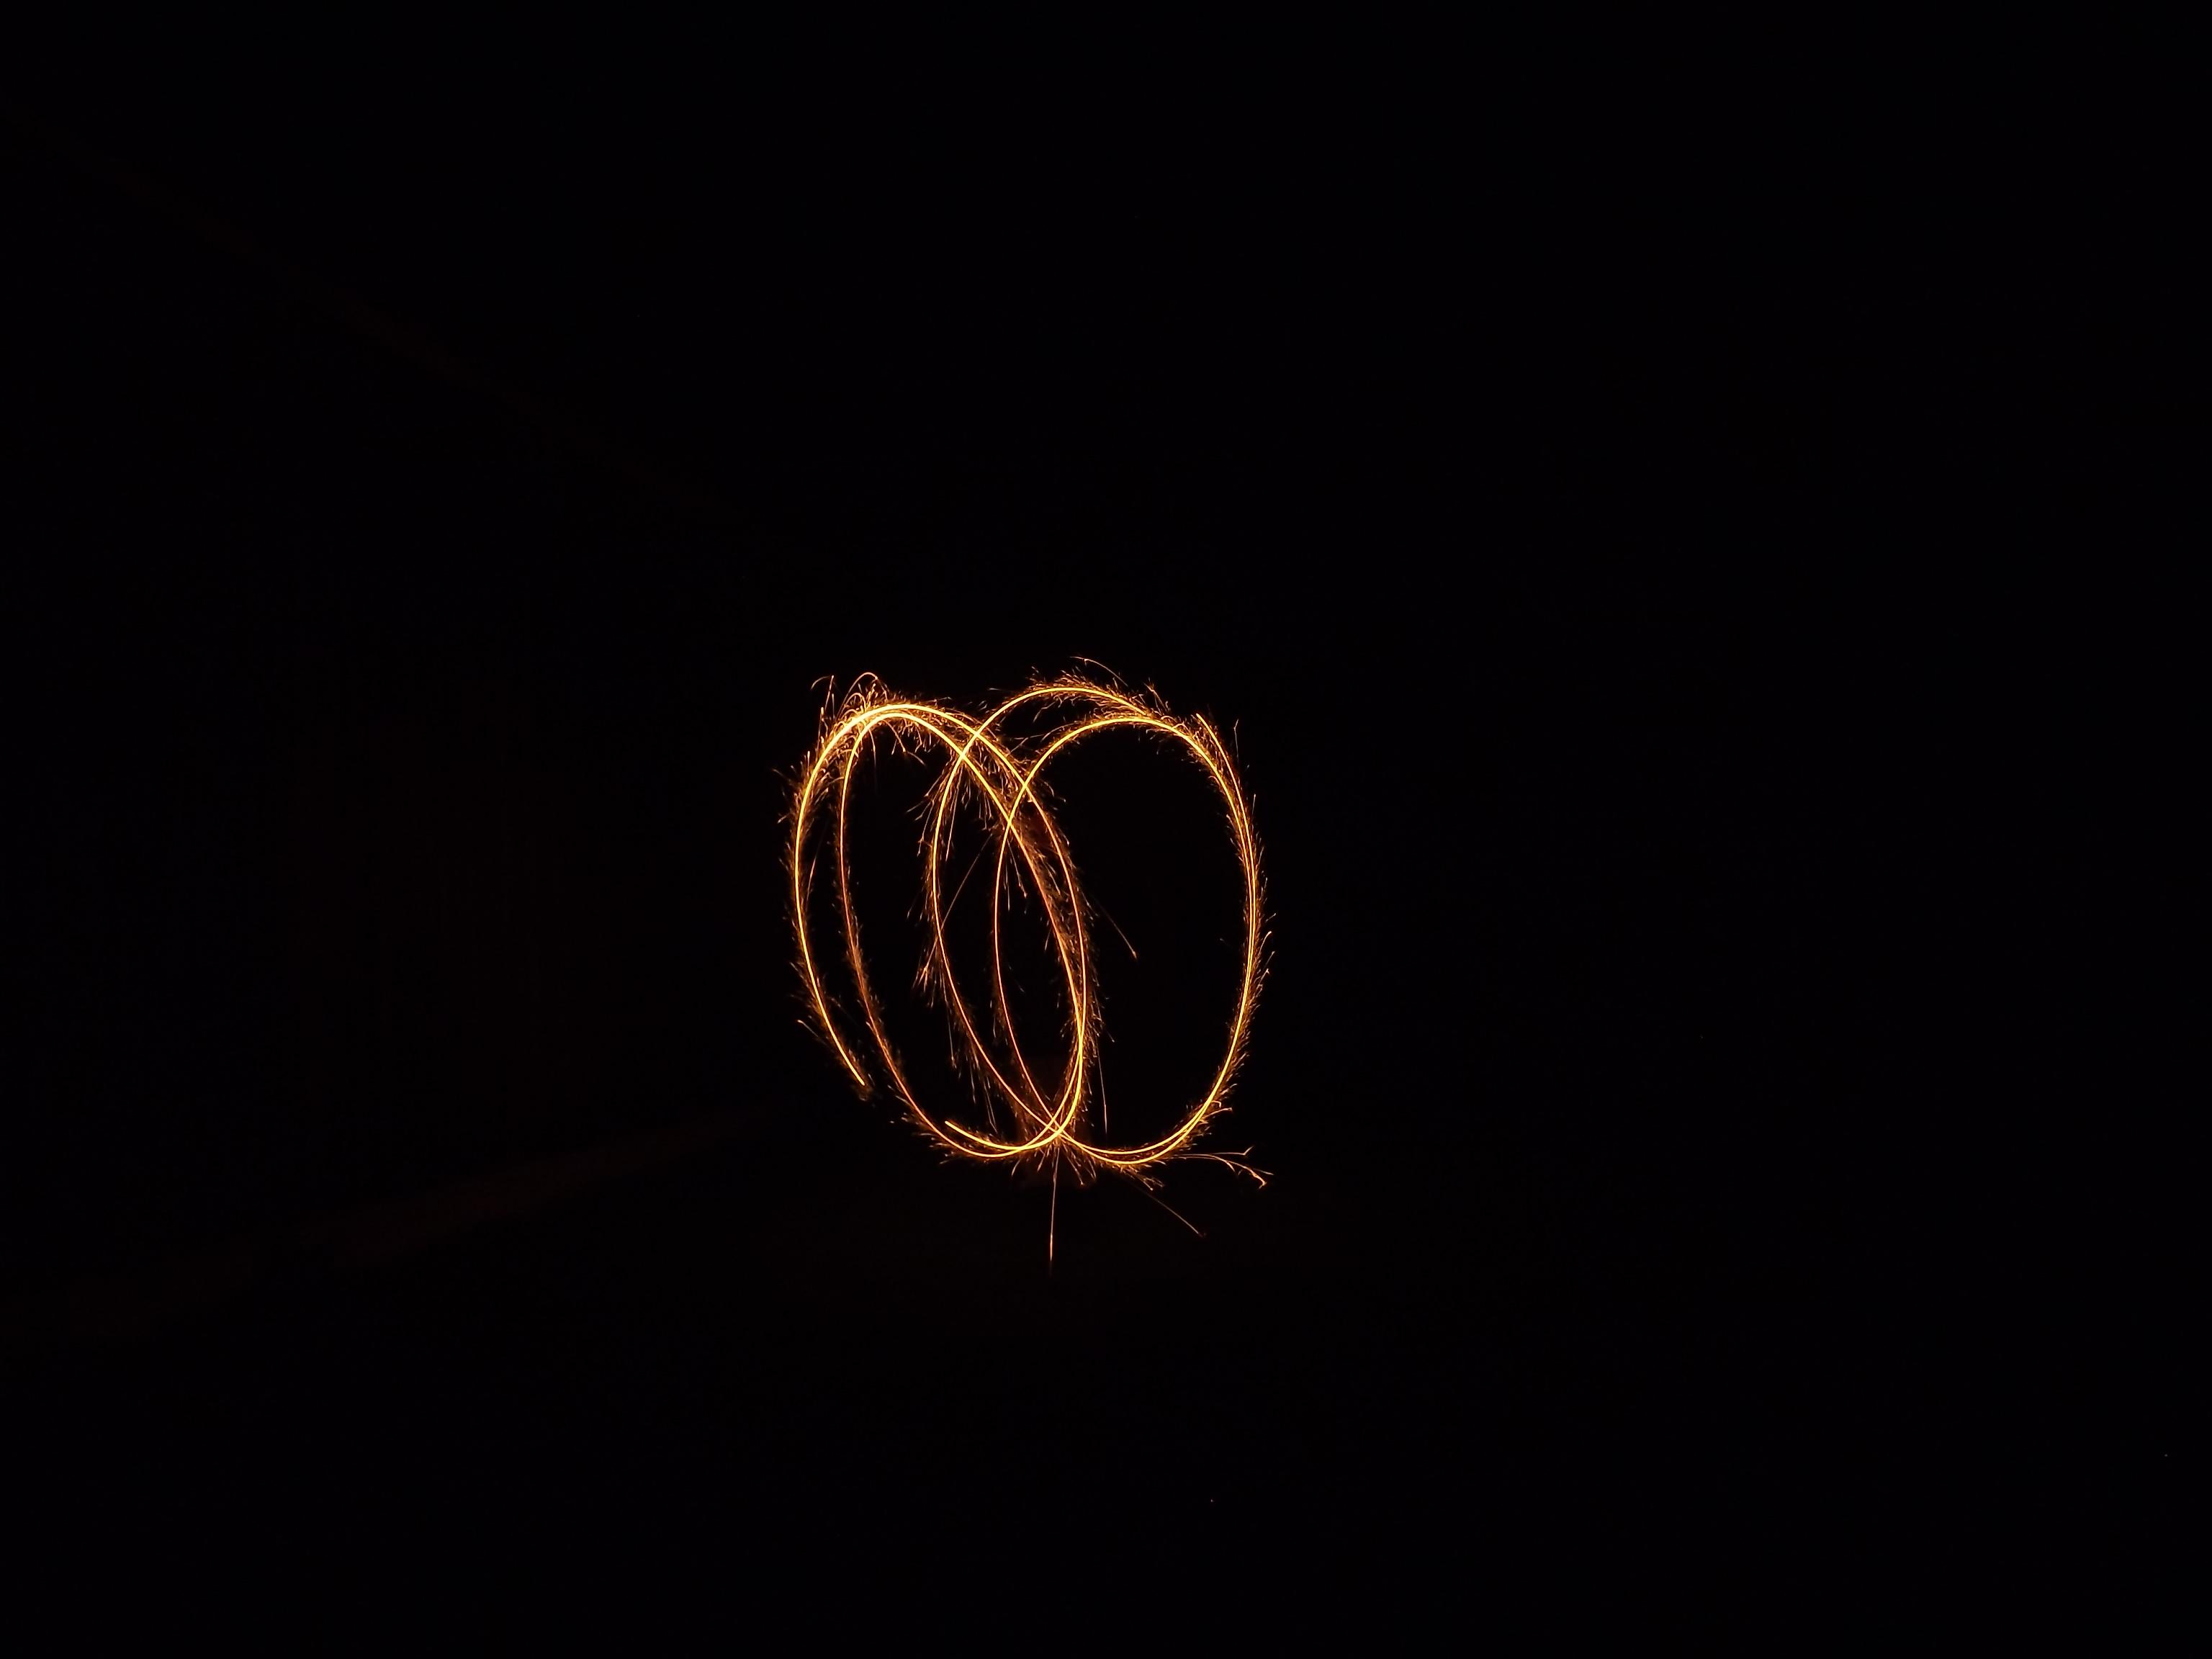 4566-feuer-ring-doppel-ueberschnitten